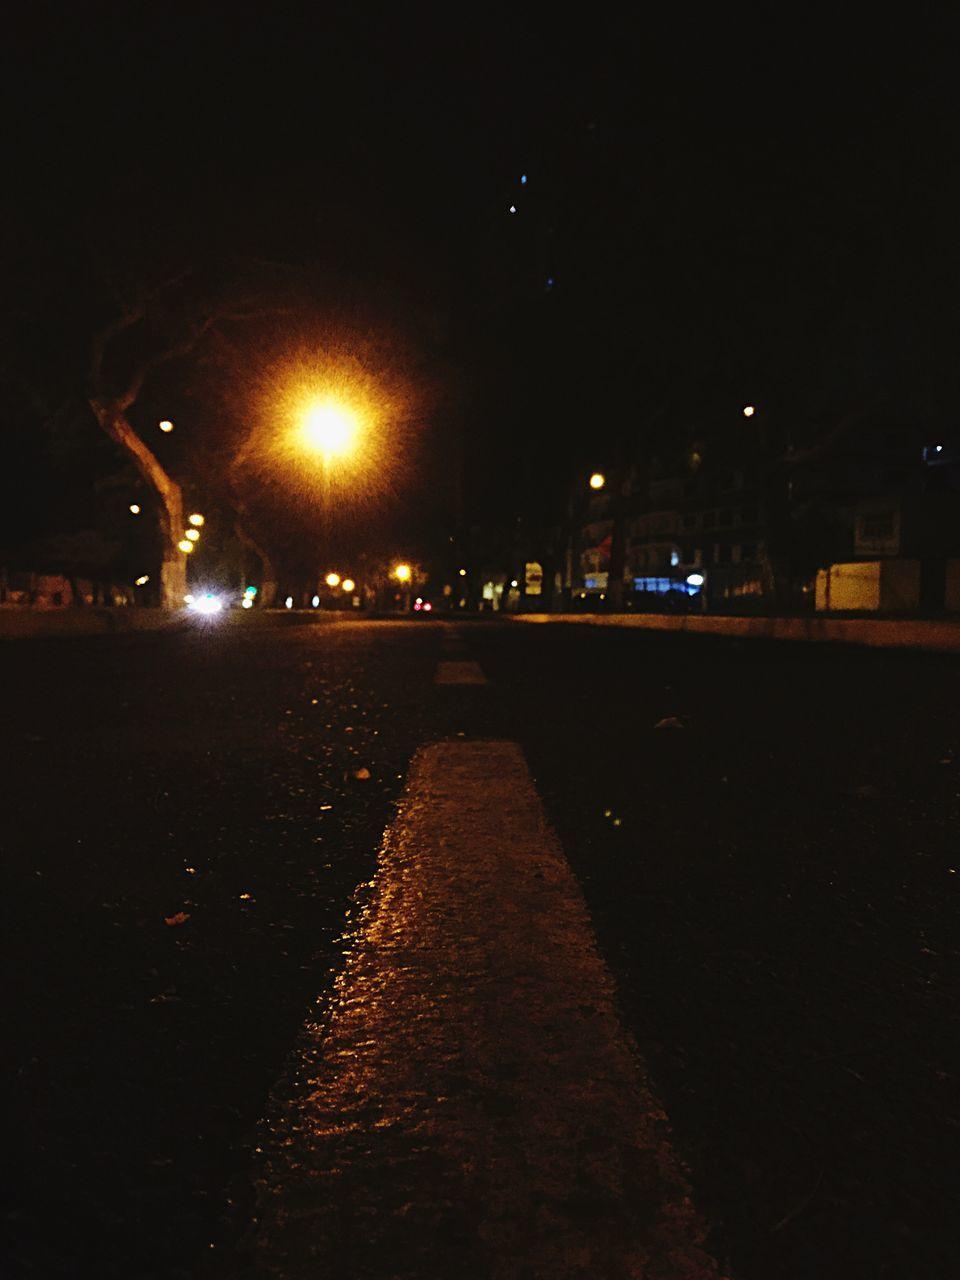 night, illuminated, street light, road, street, outdoors, no people, sky, city, architecture